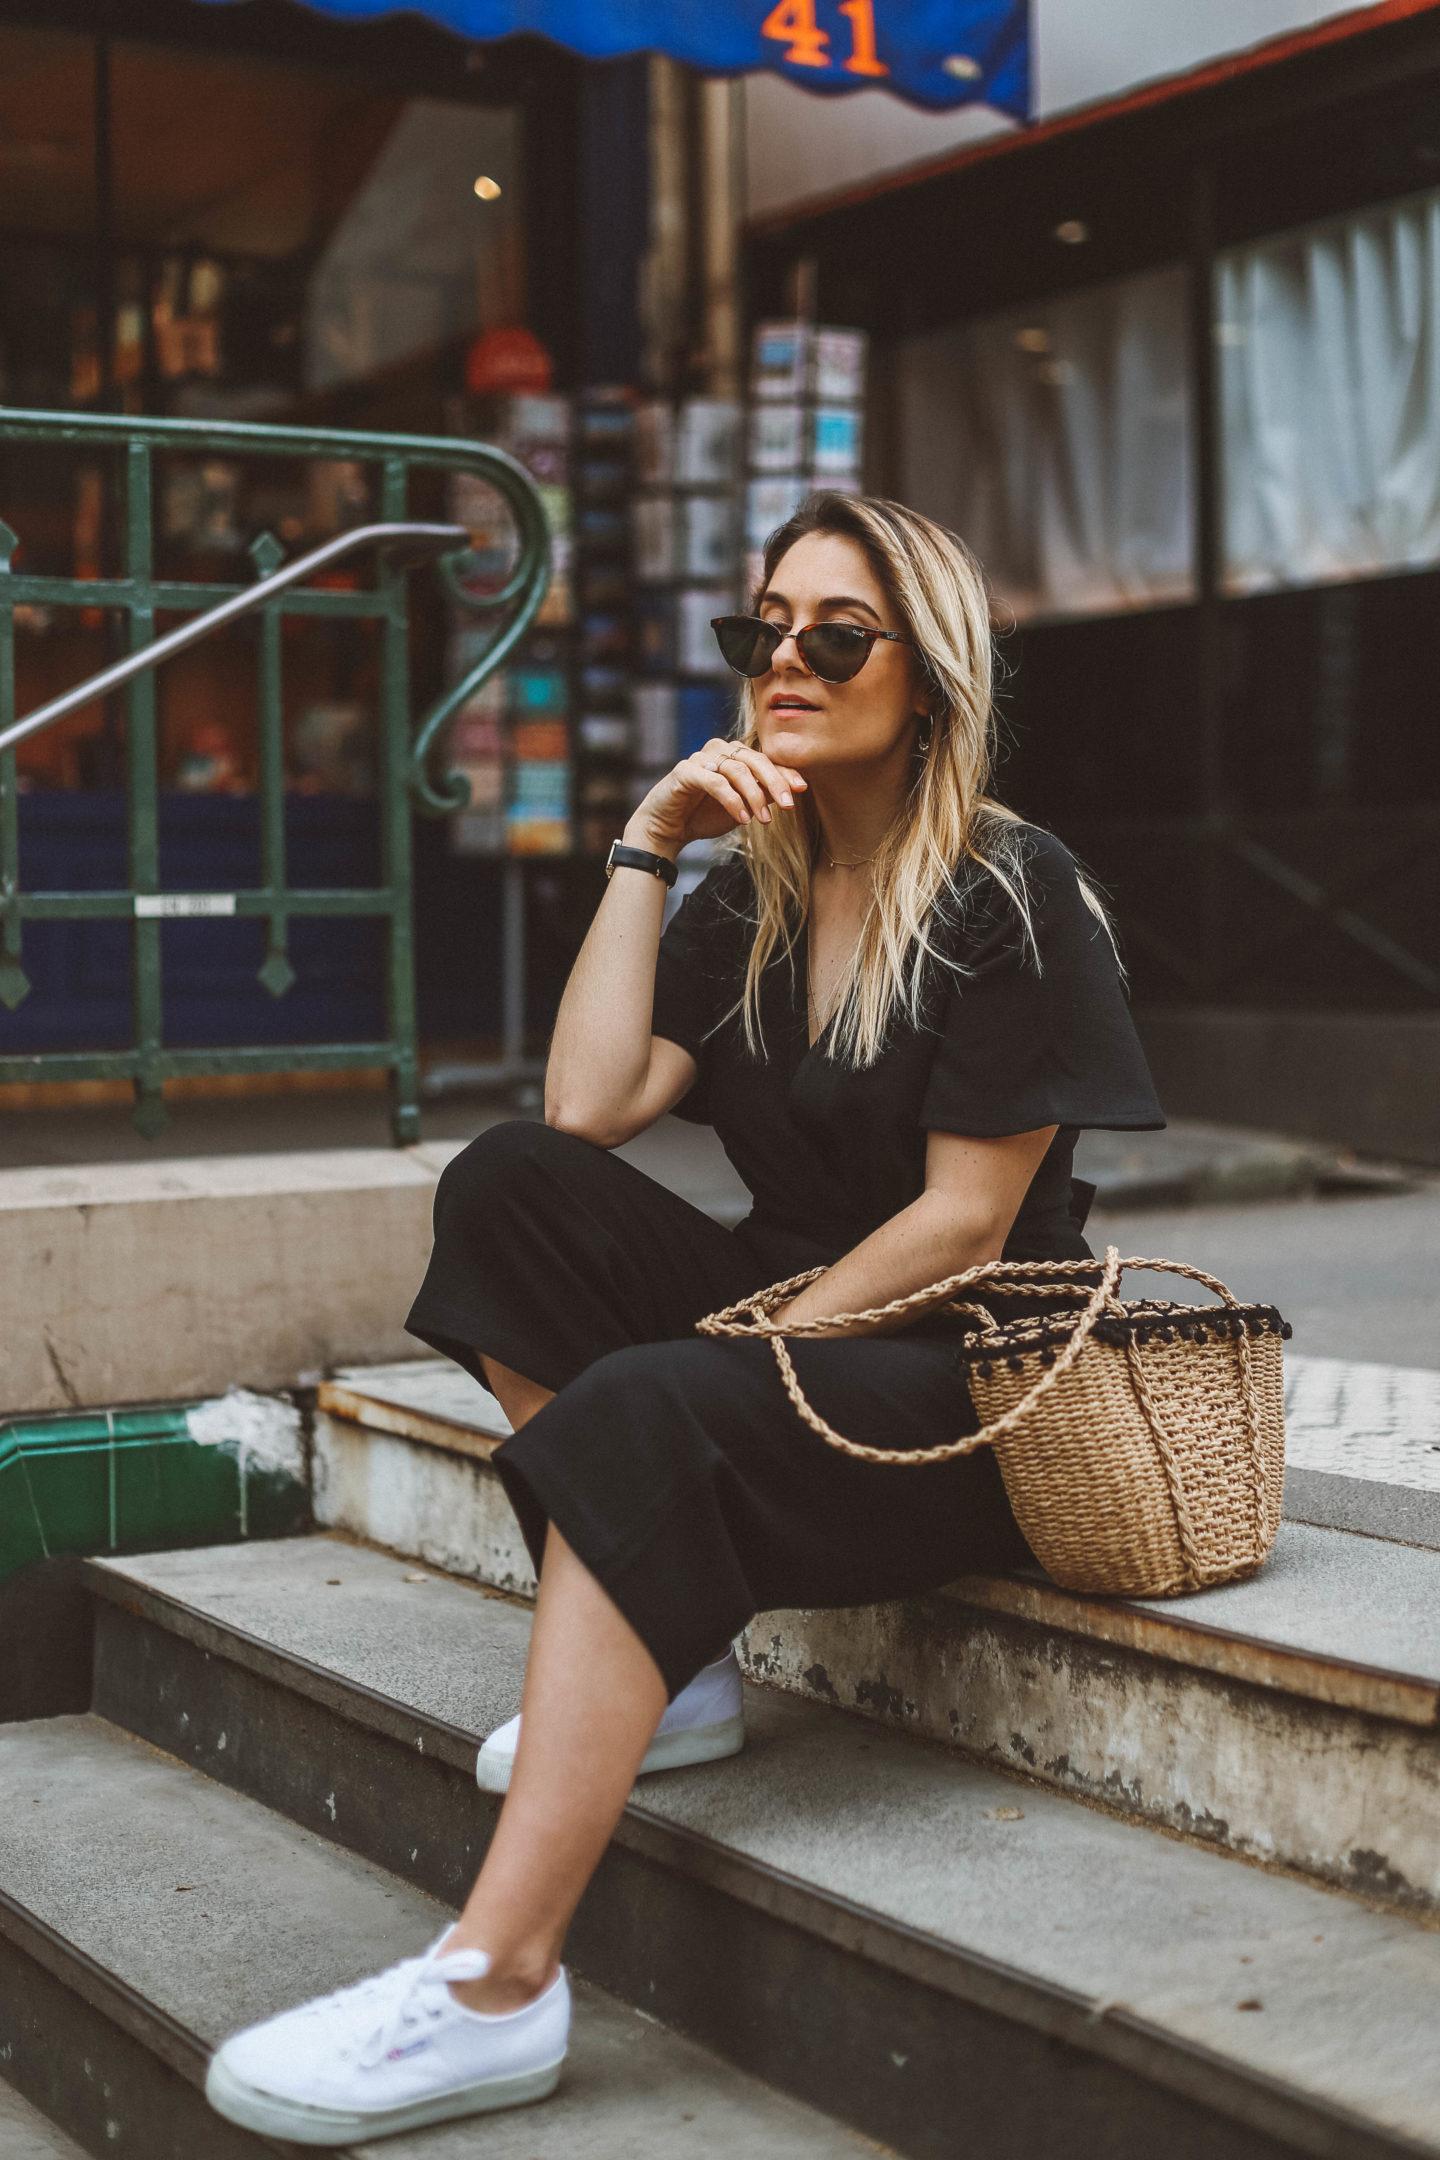 Baskets Superga - Blondie Baby blog mode Paris et voyages